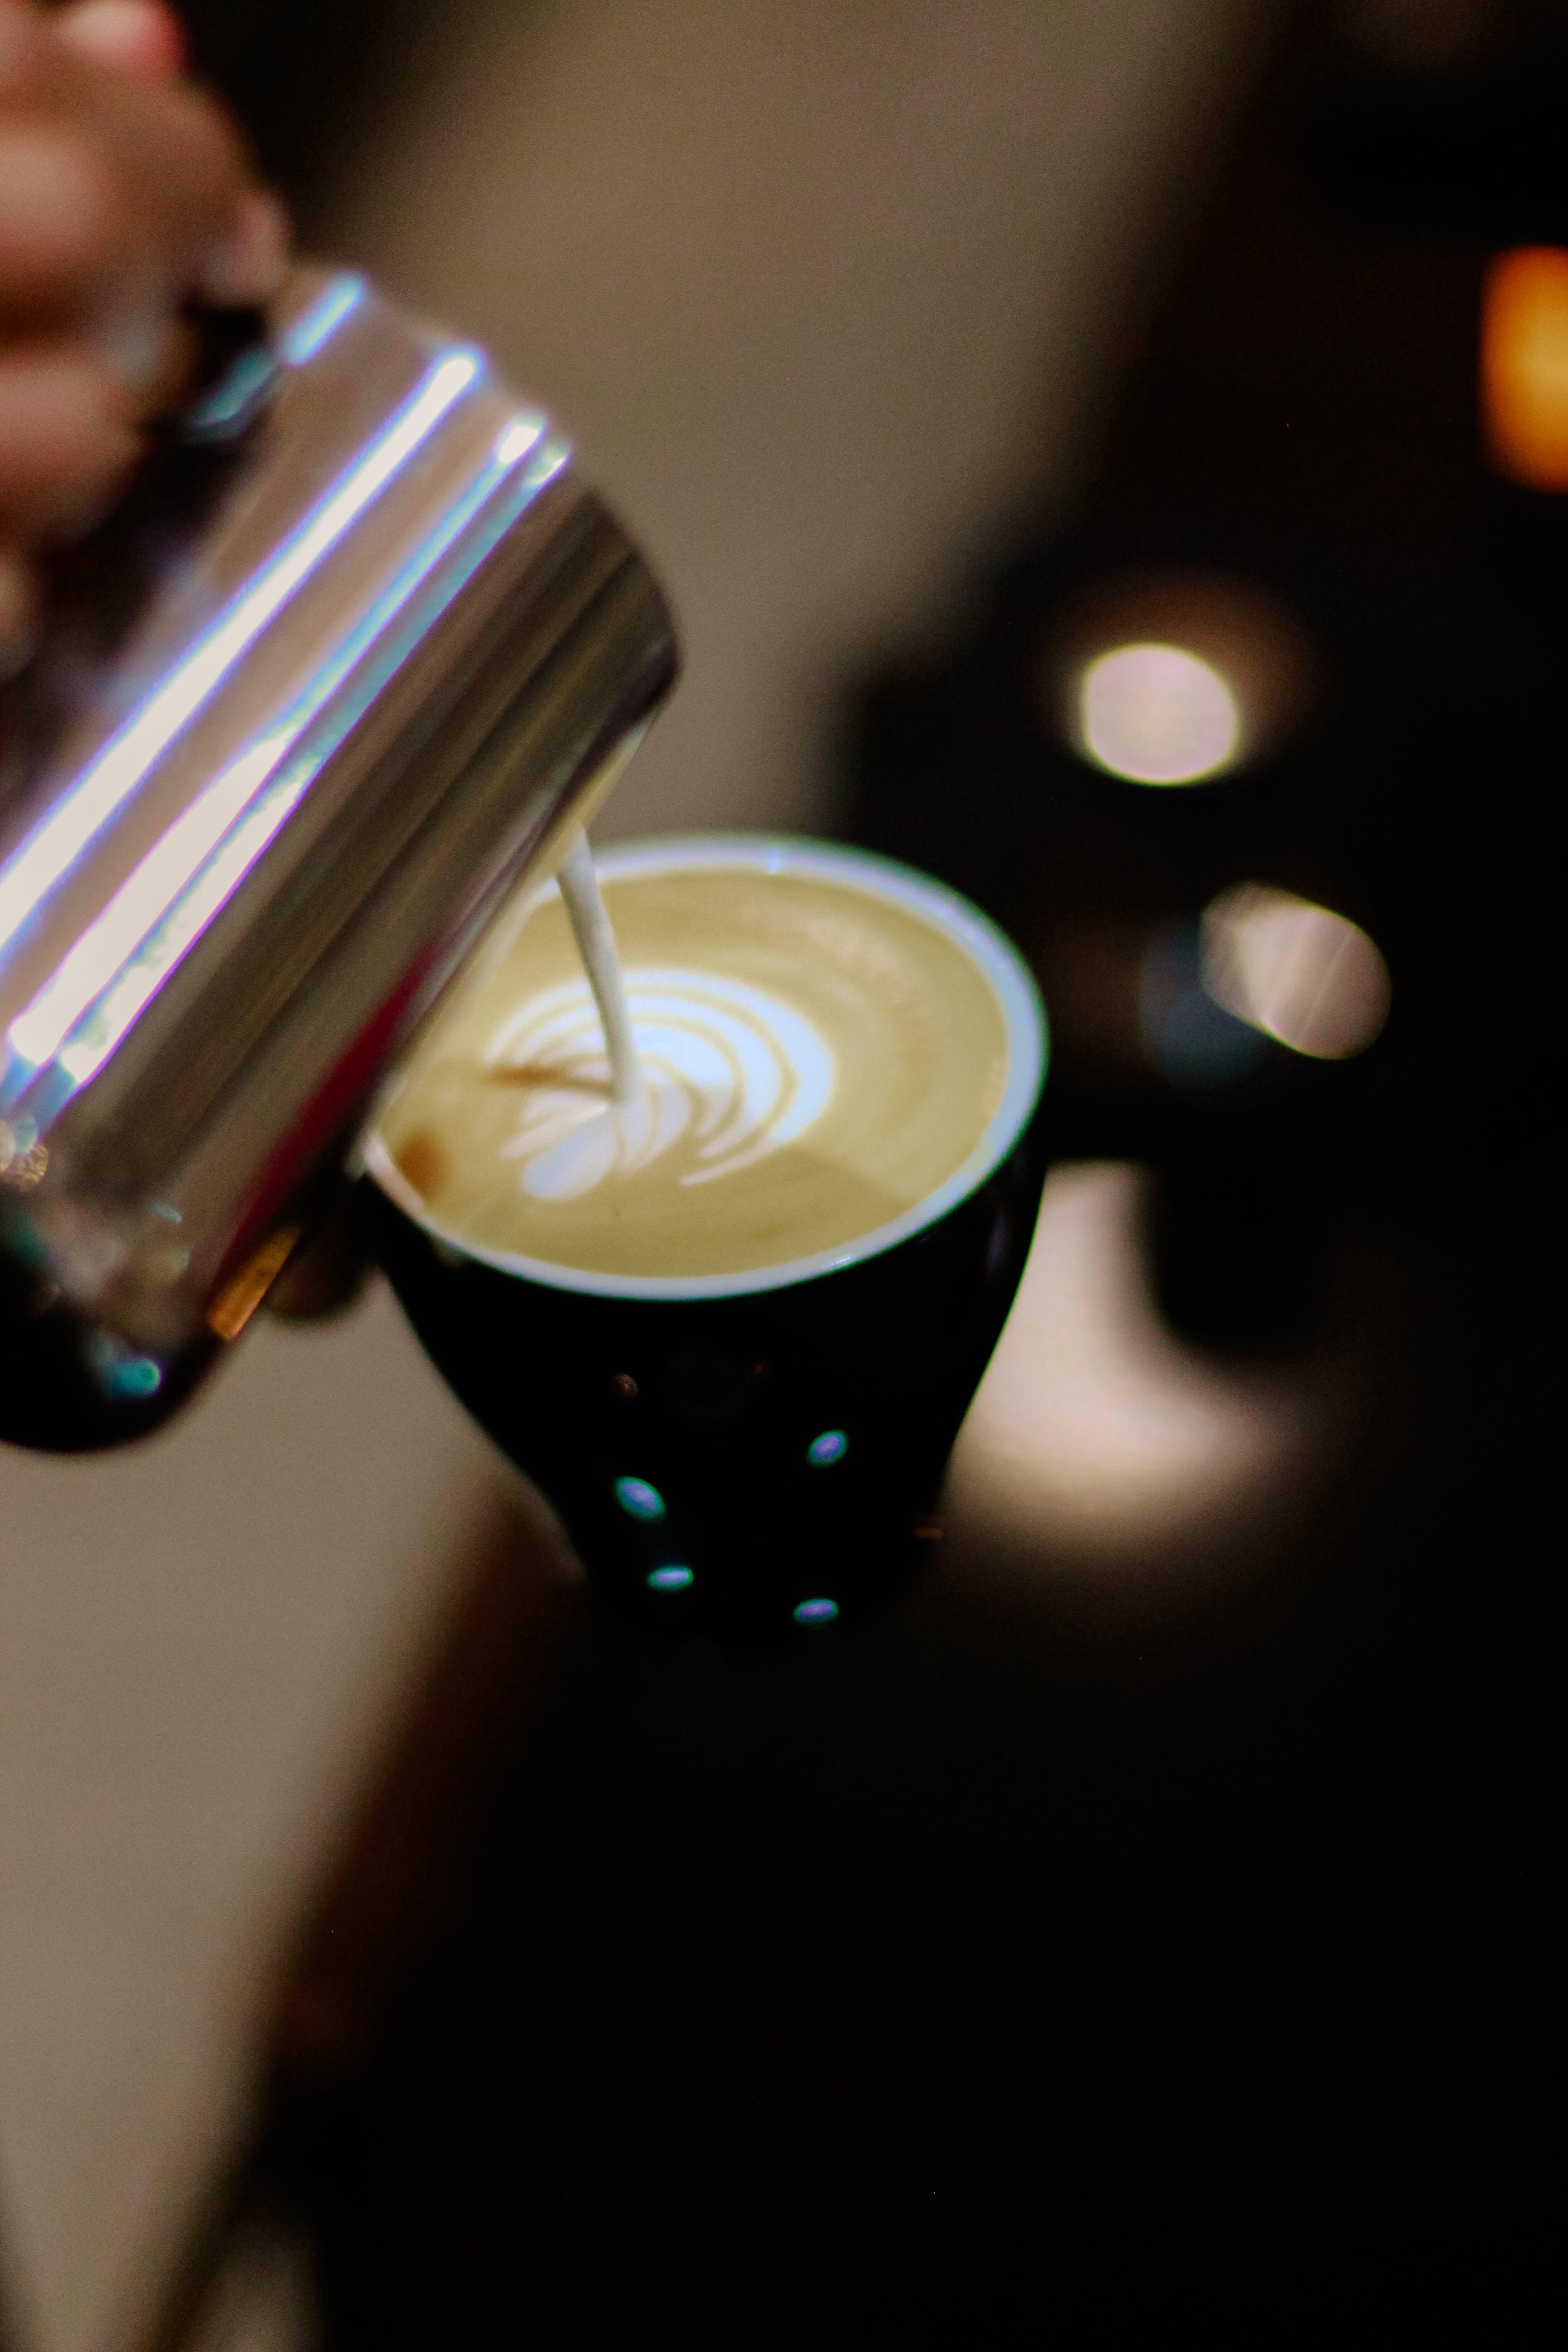 Close-up Photography of Latte Art Making